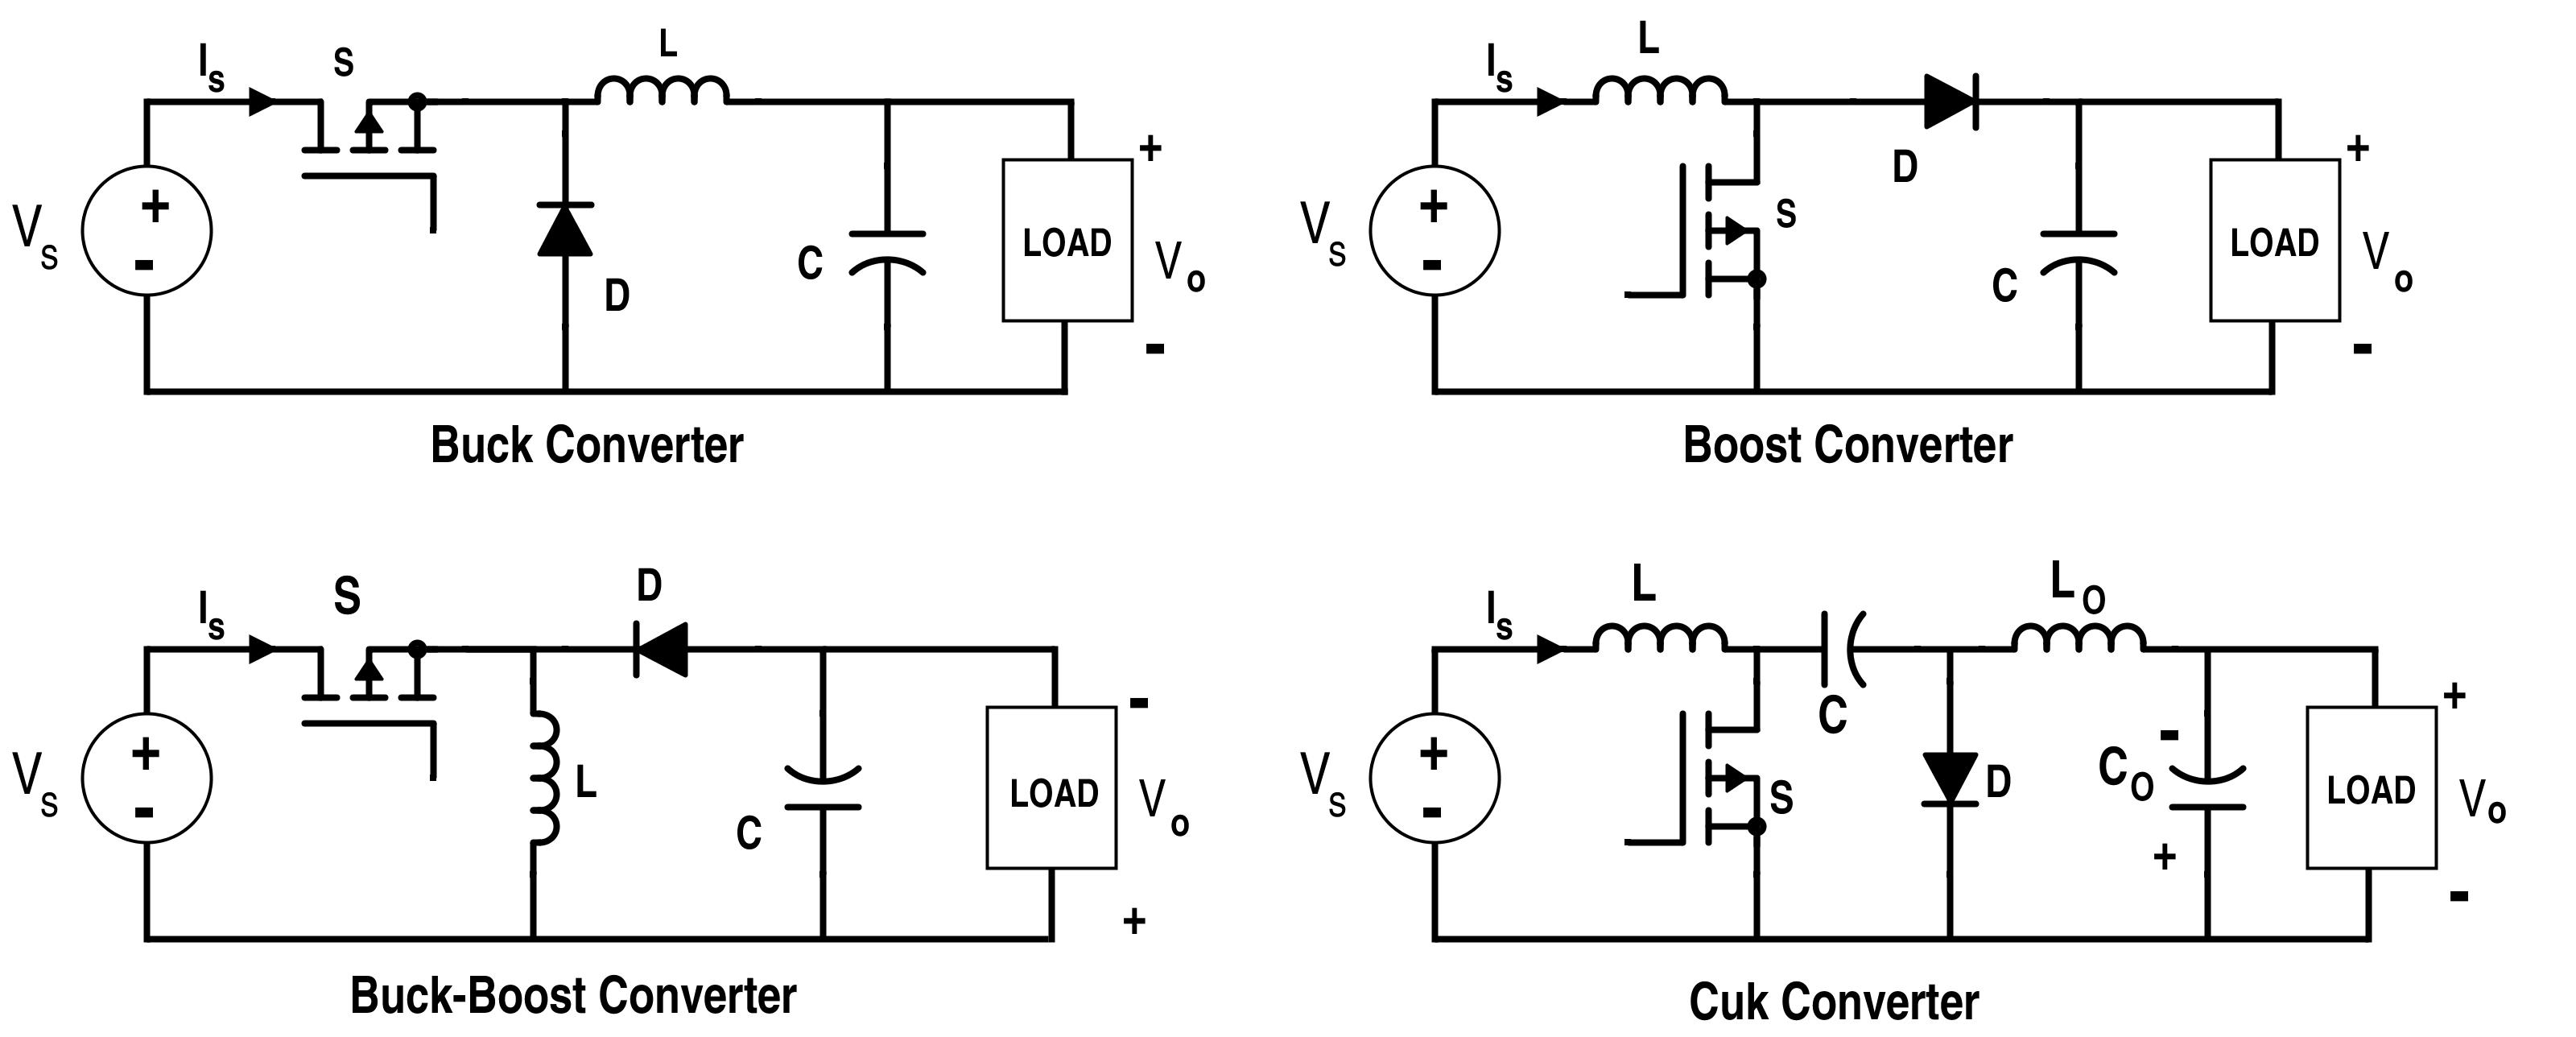 circuit diagram of buck boost converter 98 ez go wiring analysis four dc converters in equilibrium basic